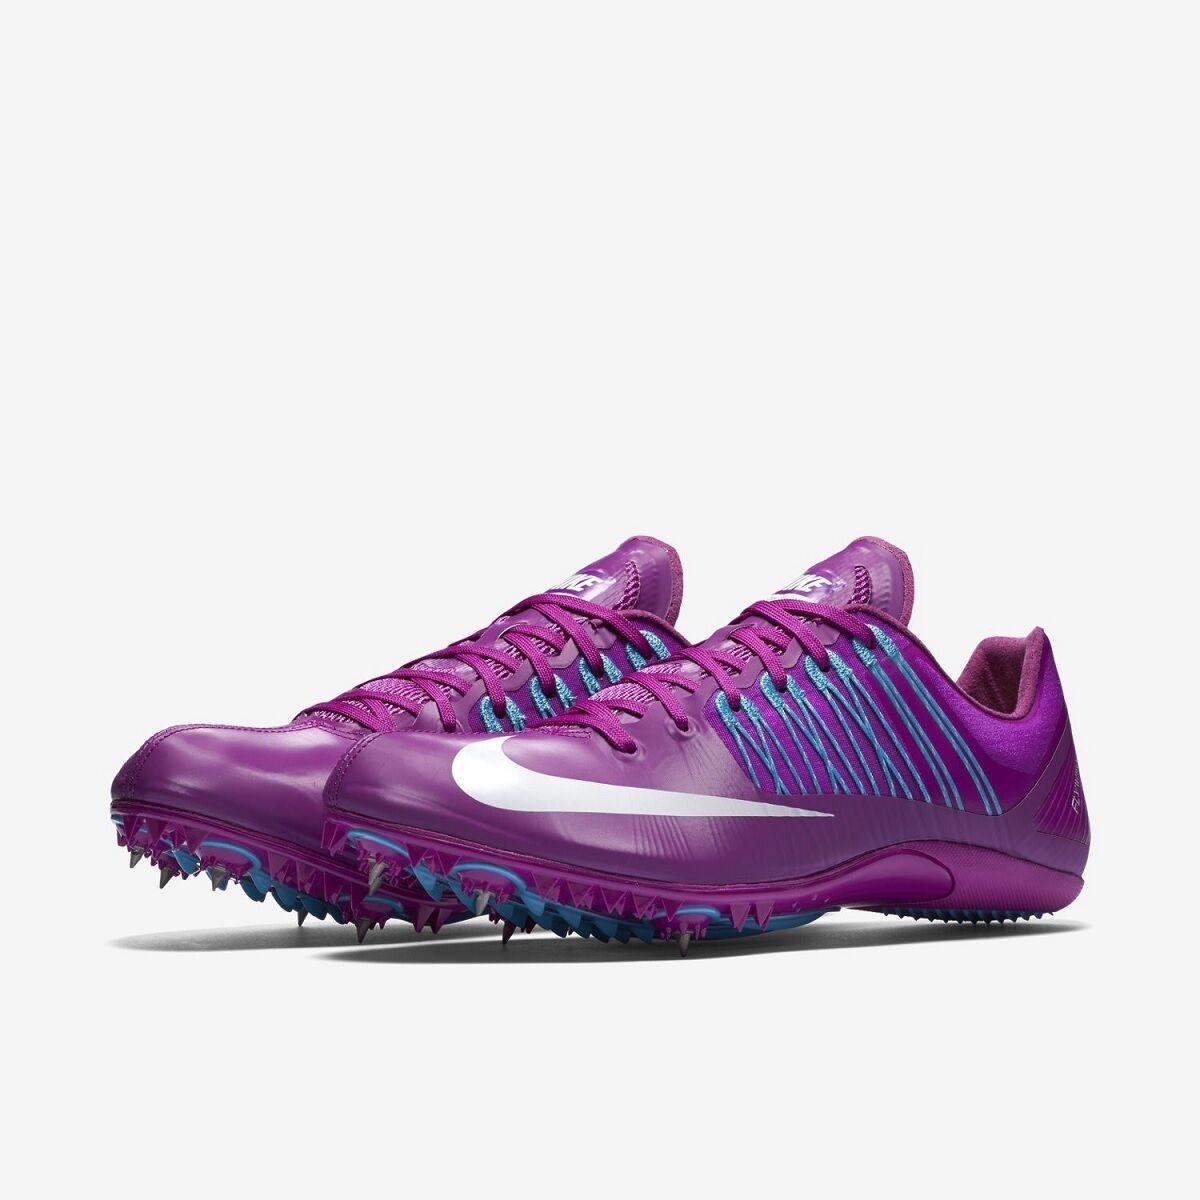 Nike CELAR V Sprint Running purple blueE 629226 514 SIZE 9.5 with Xtra Spikes&SRT